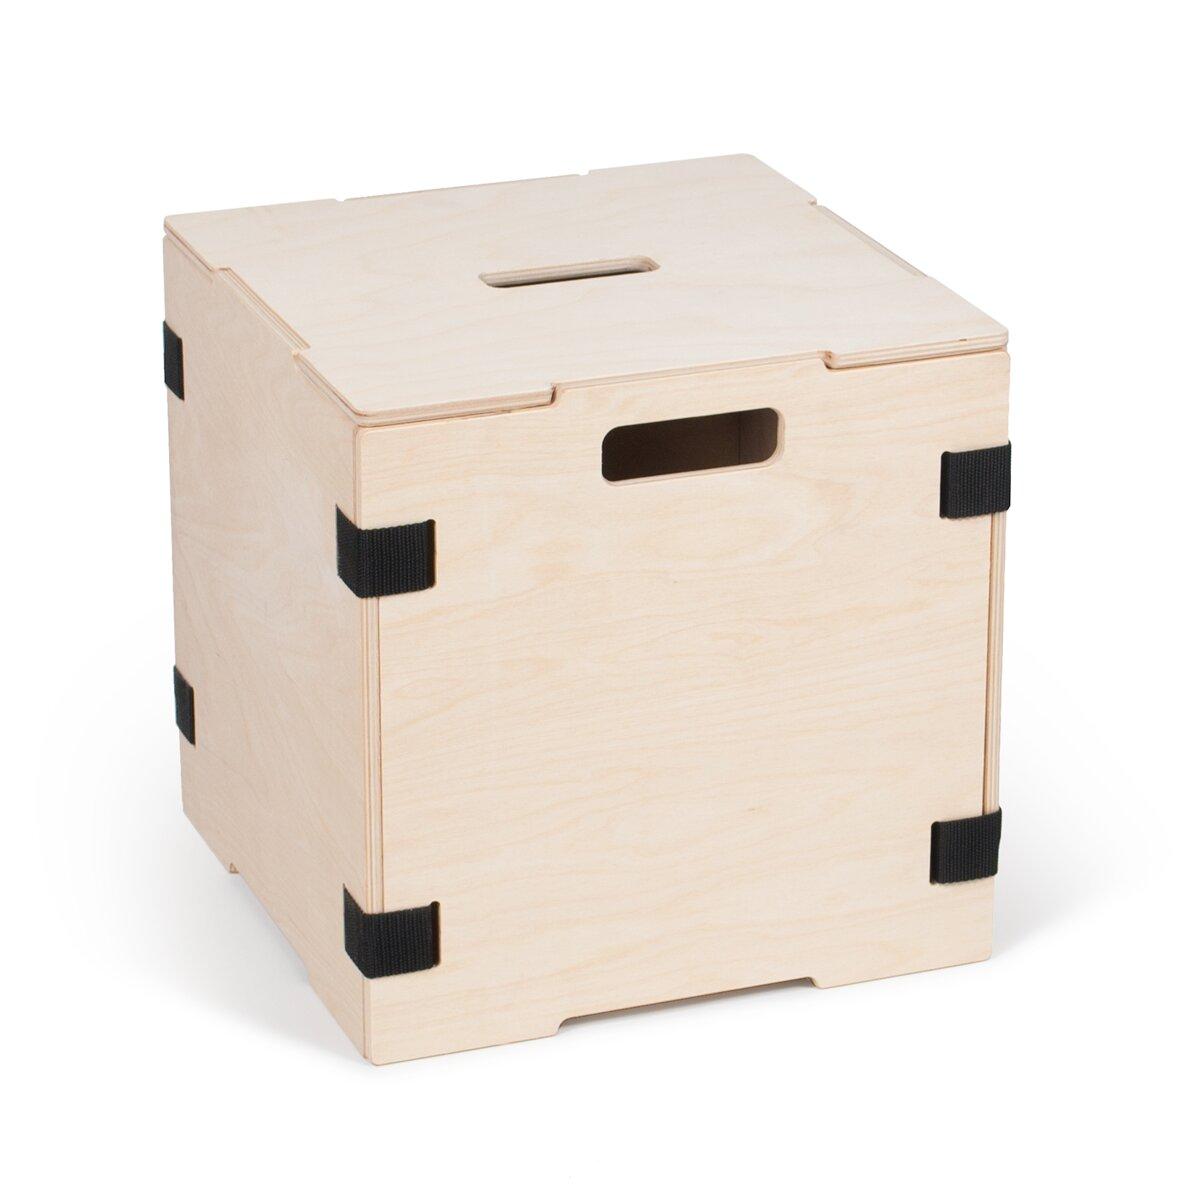 cube storage box with lid wayfair. Black Bedroom Furniture Sets. Home Design Ideas